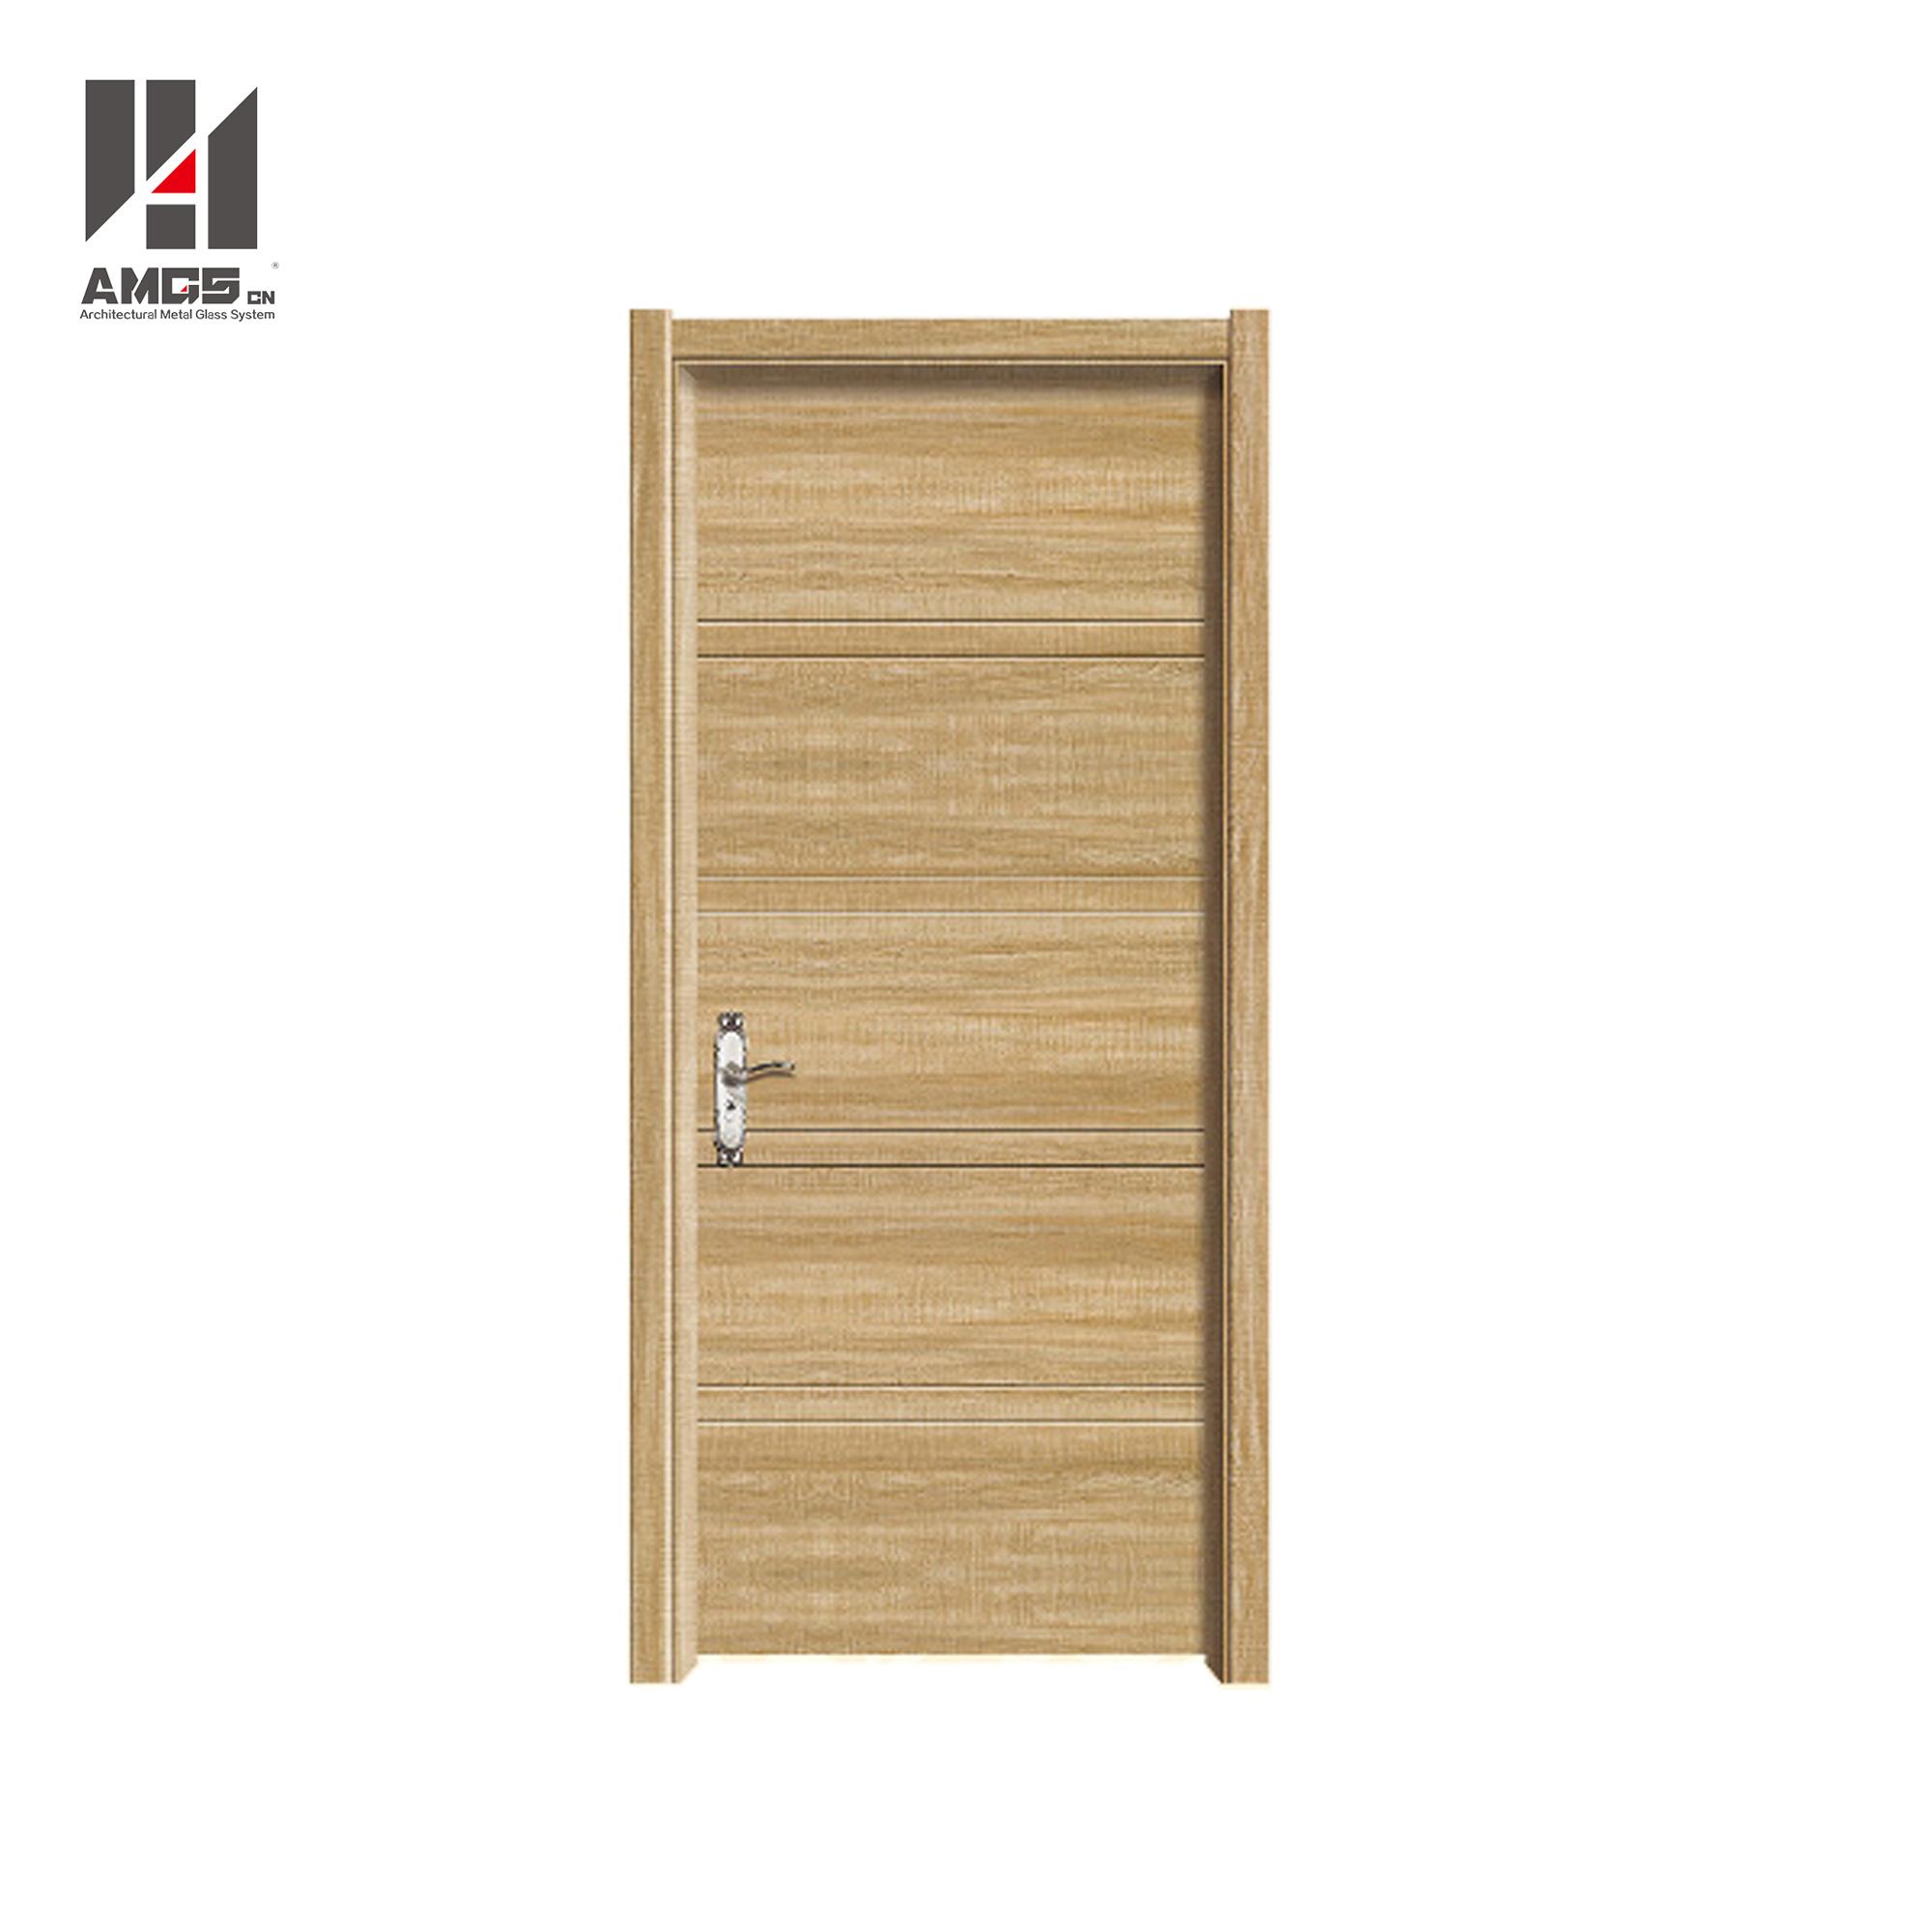 Modern single door designs for houses Front Door Good Price Modern Main Single Entry Door Wood Door Designs For Houses Youtube Good Price Modern Main Single Entry Door Wood Door Designs For